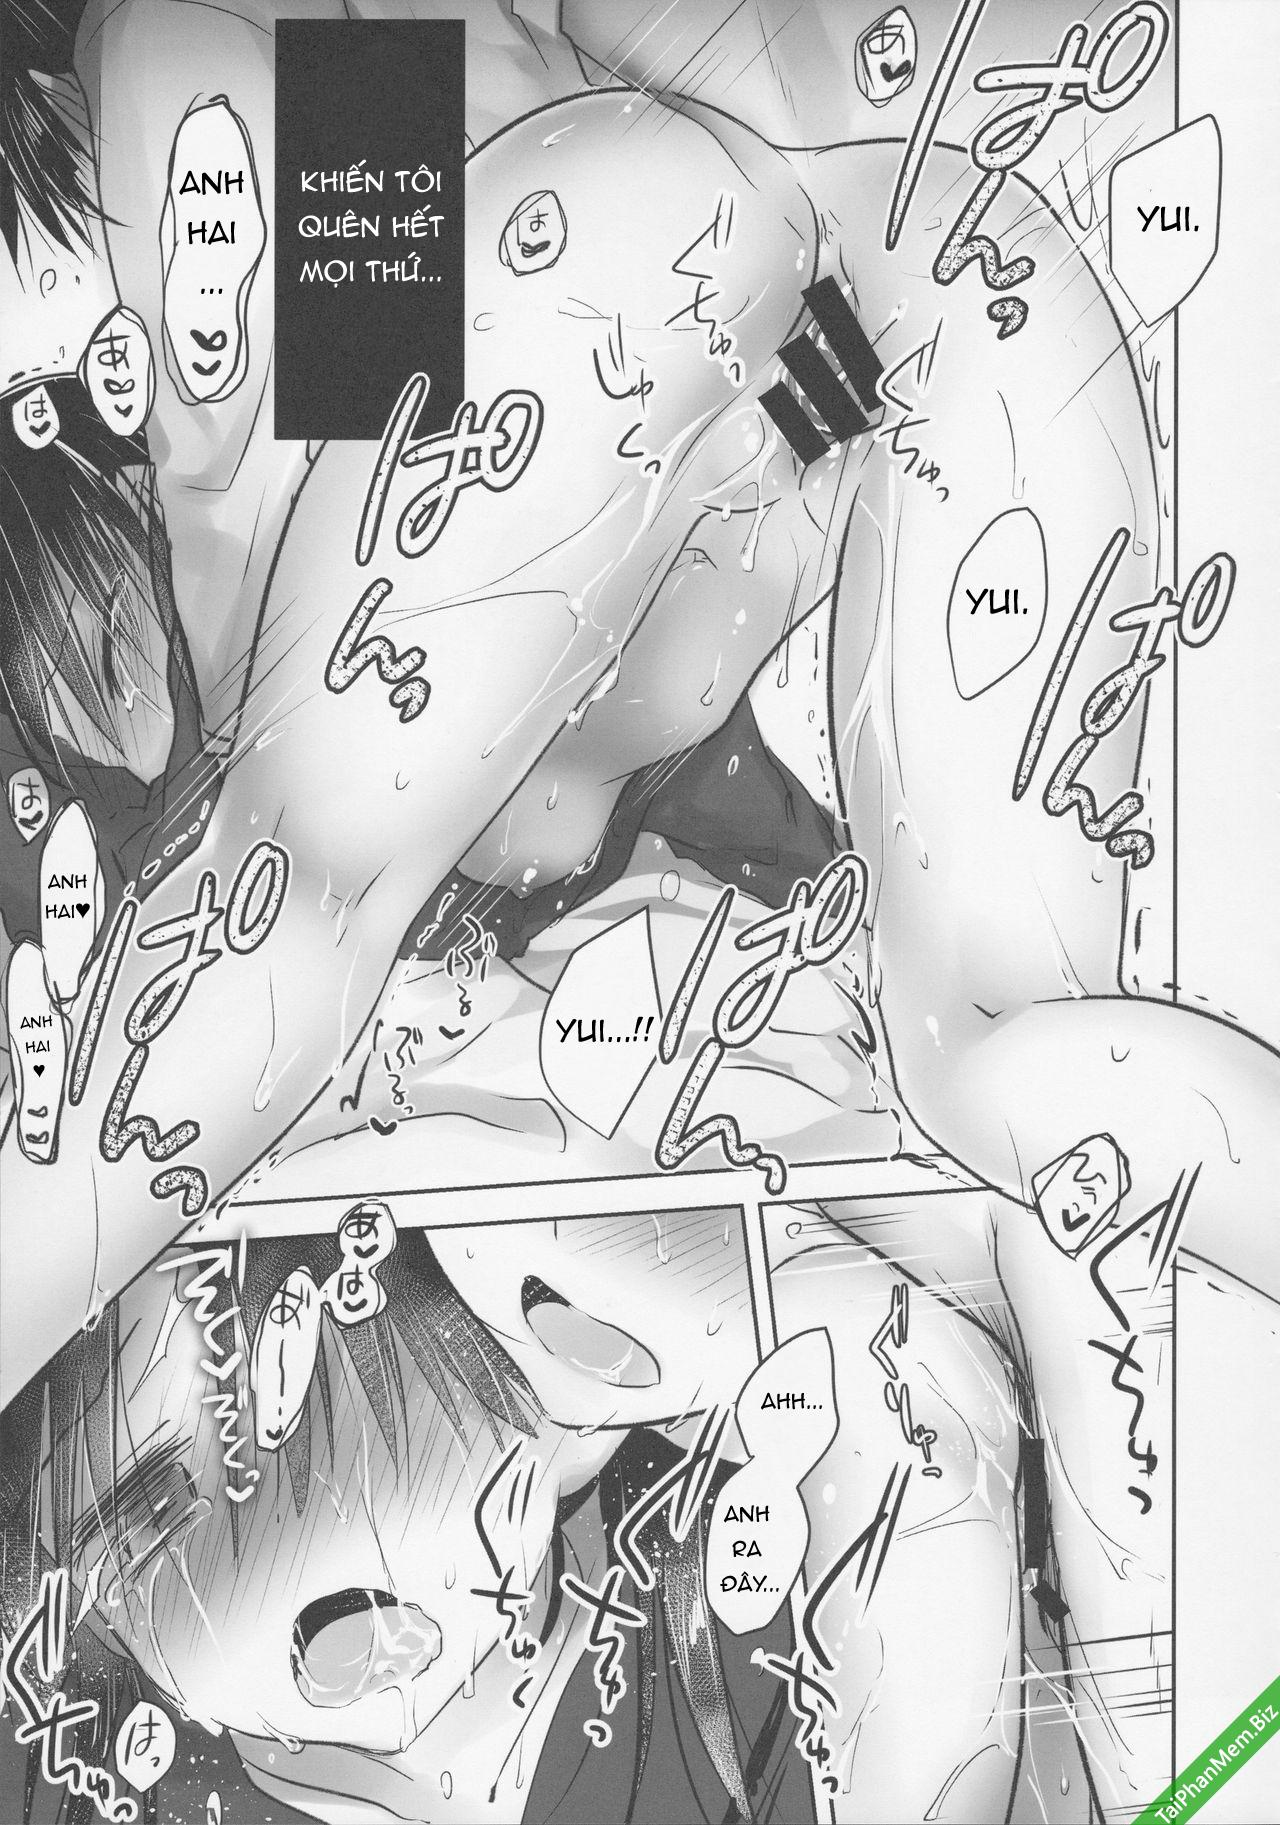 HentaiVN.net - Ảnh 35 - Omocha Sex - Chap 5